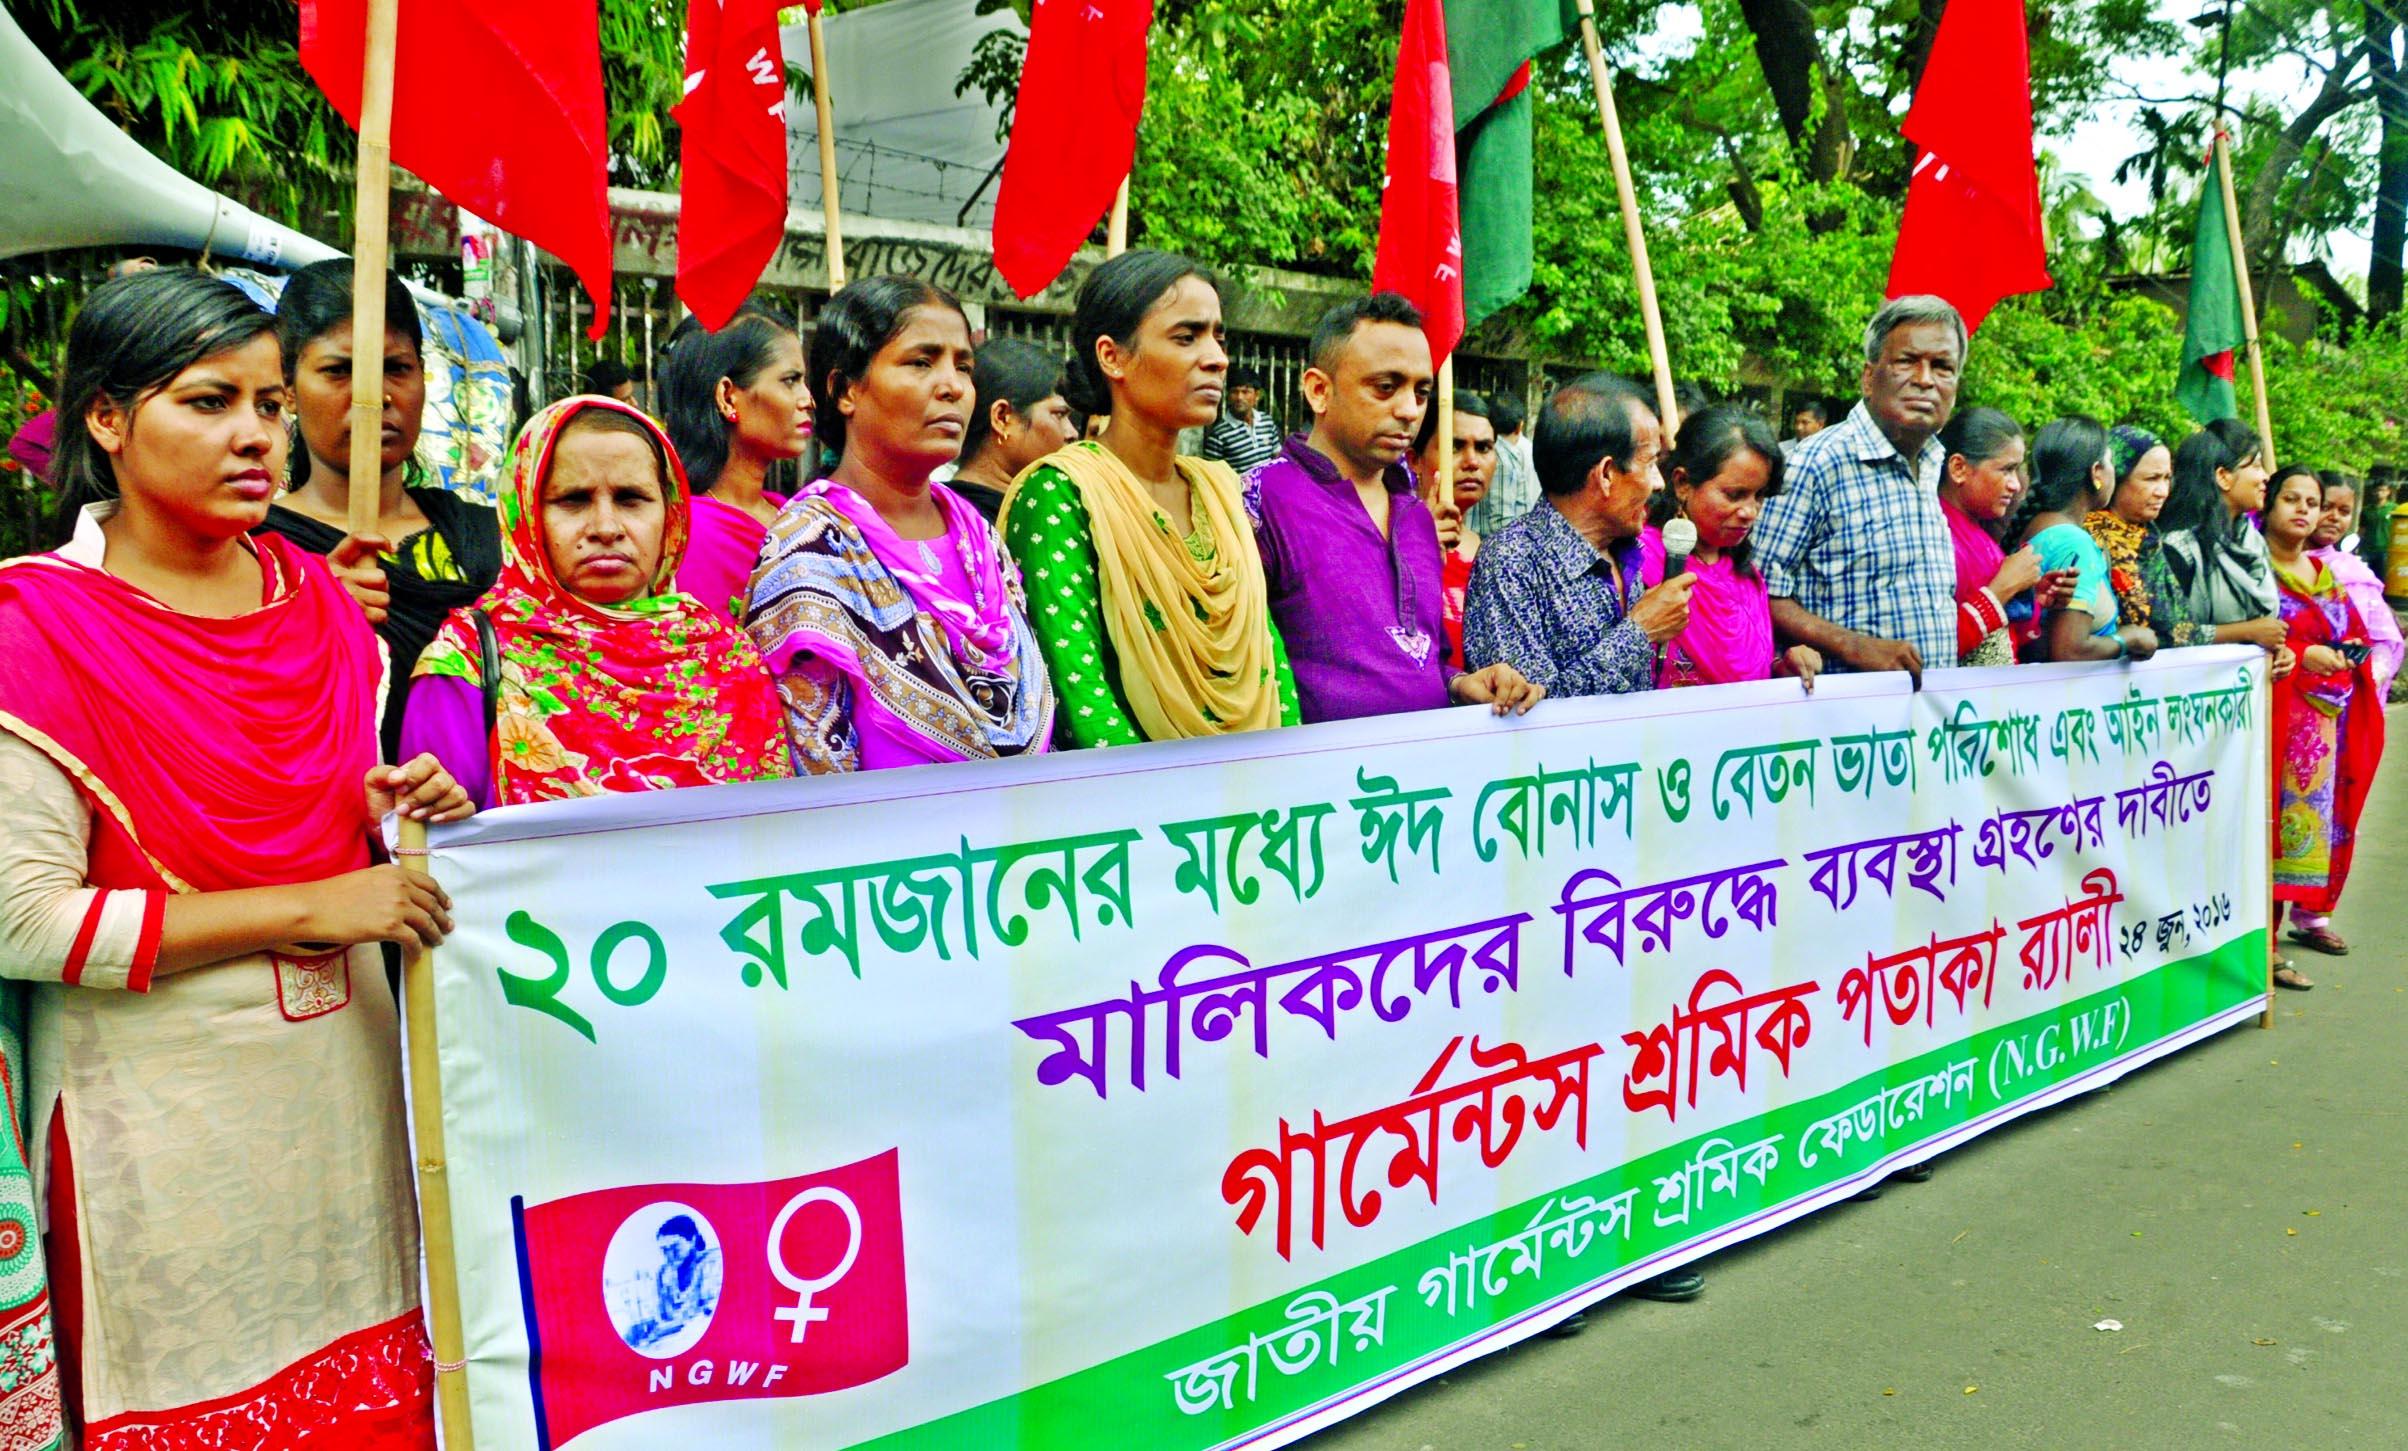 Jatiya Garments Sramik Federation formed a human chain in front of Jatiya Press Club on Friday demanding payment of salary and Eid bonus of all garments workers by Ramzan 20.